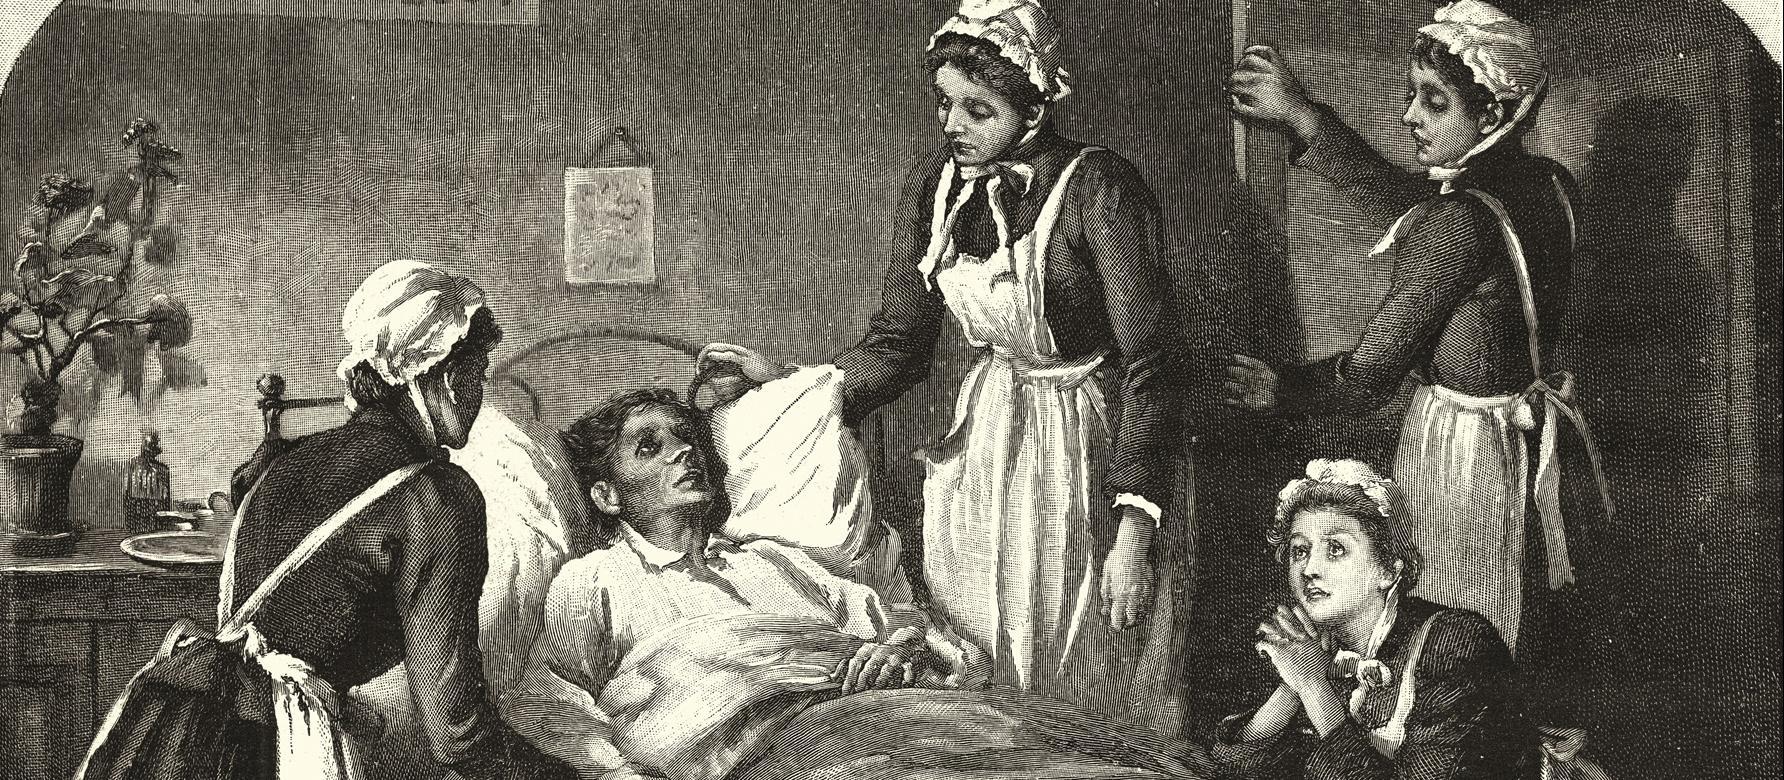 Nursing Care at RCH in the 1920s | Vintage nurse, Nursing